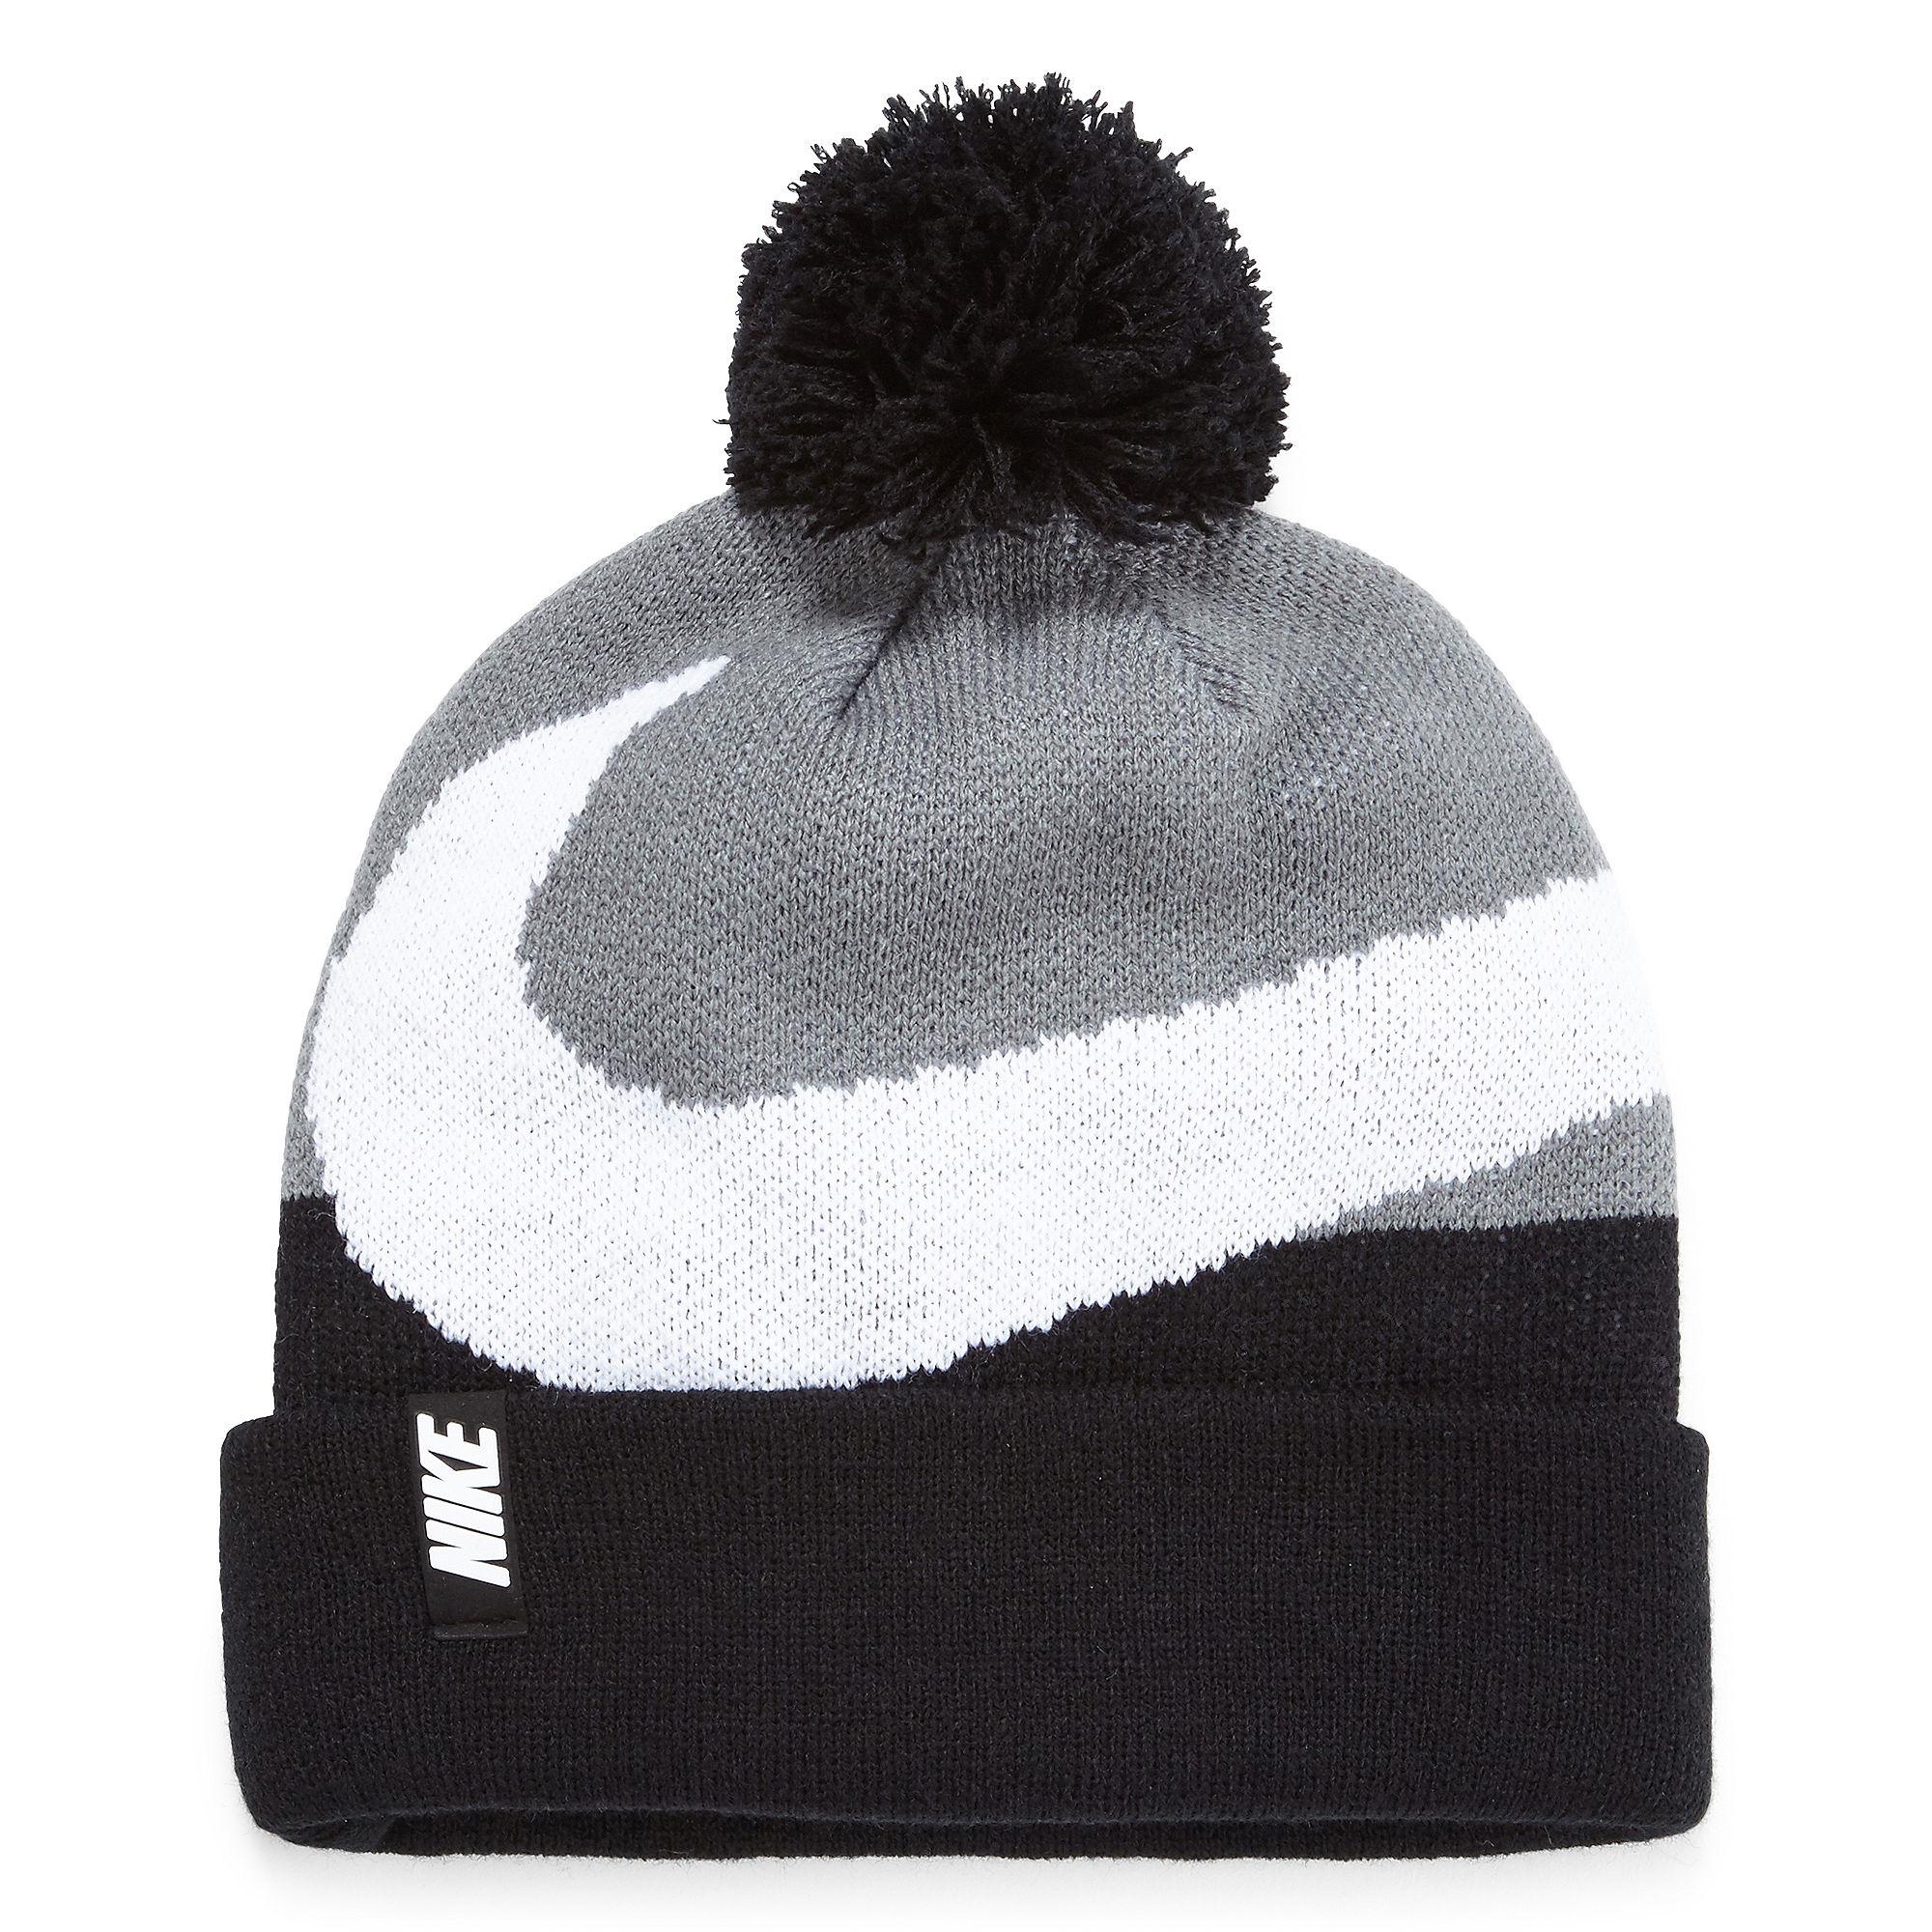 UPC 617845574933 product image for Boys Nike Swoosh Pom Pom Beanie Hat  Black/gray |